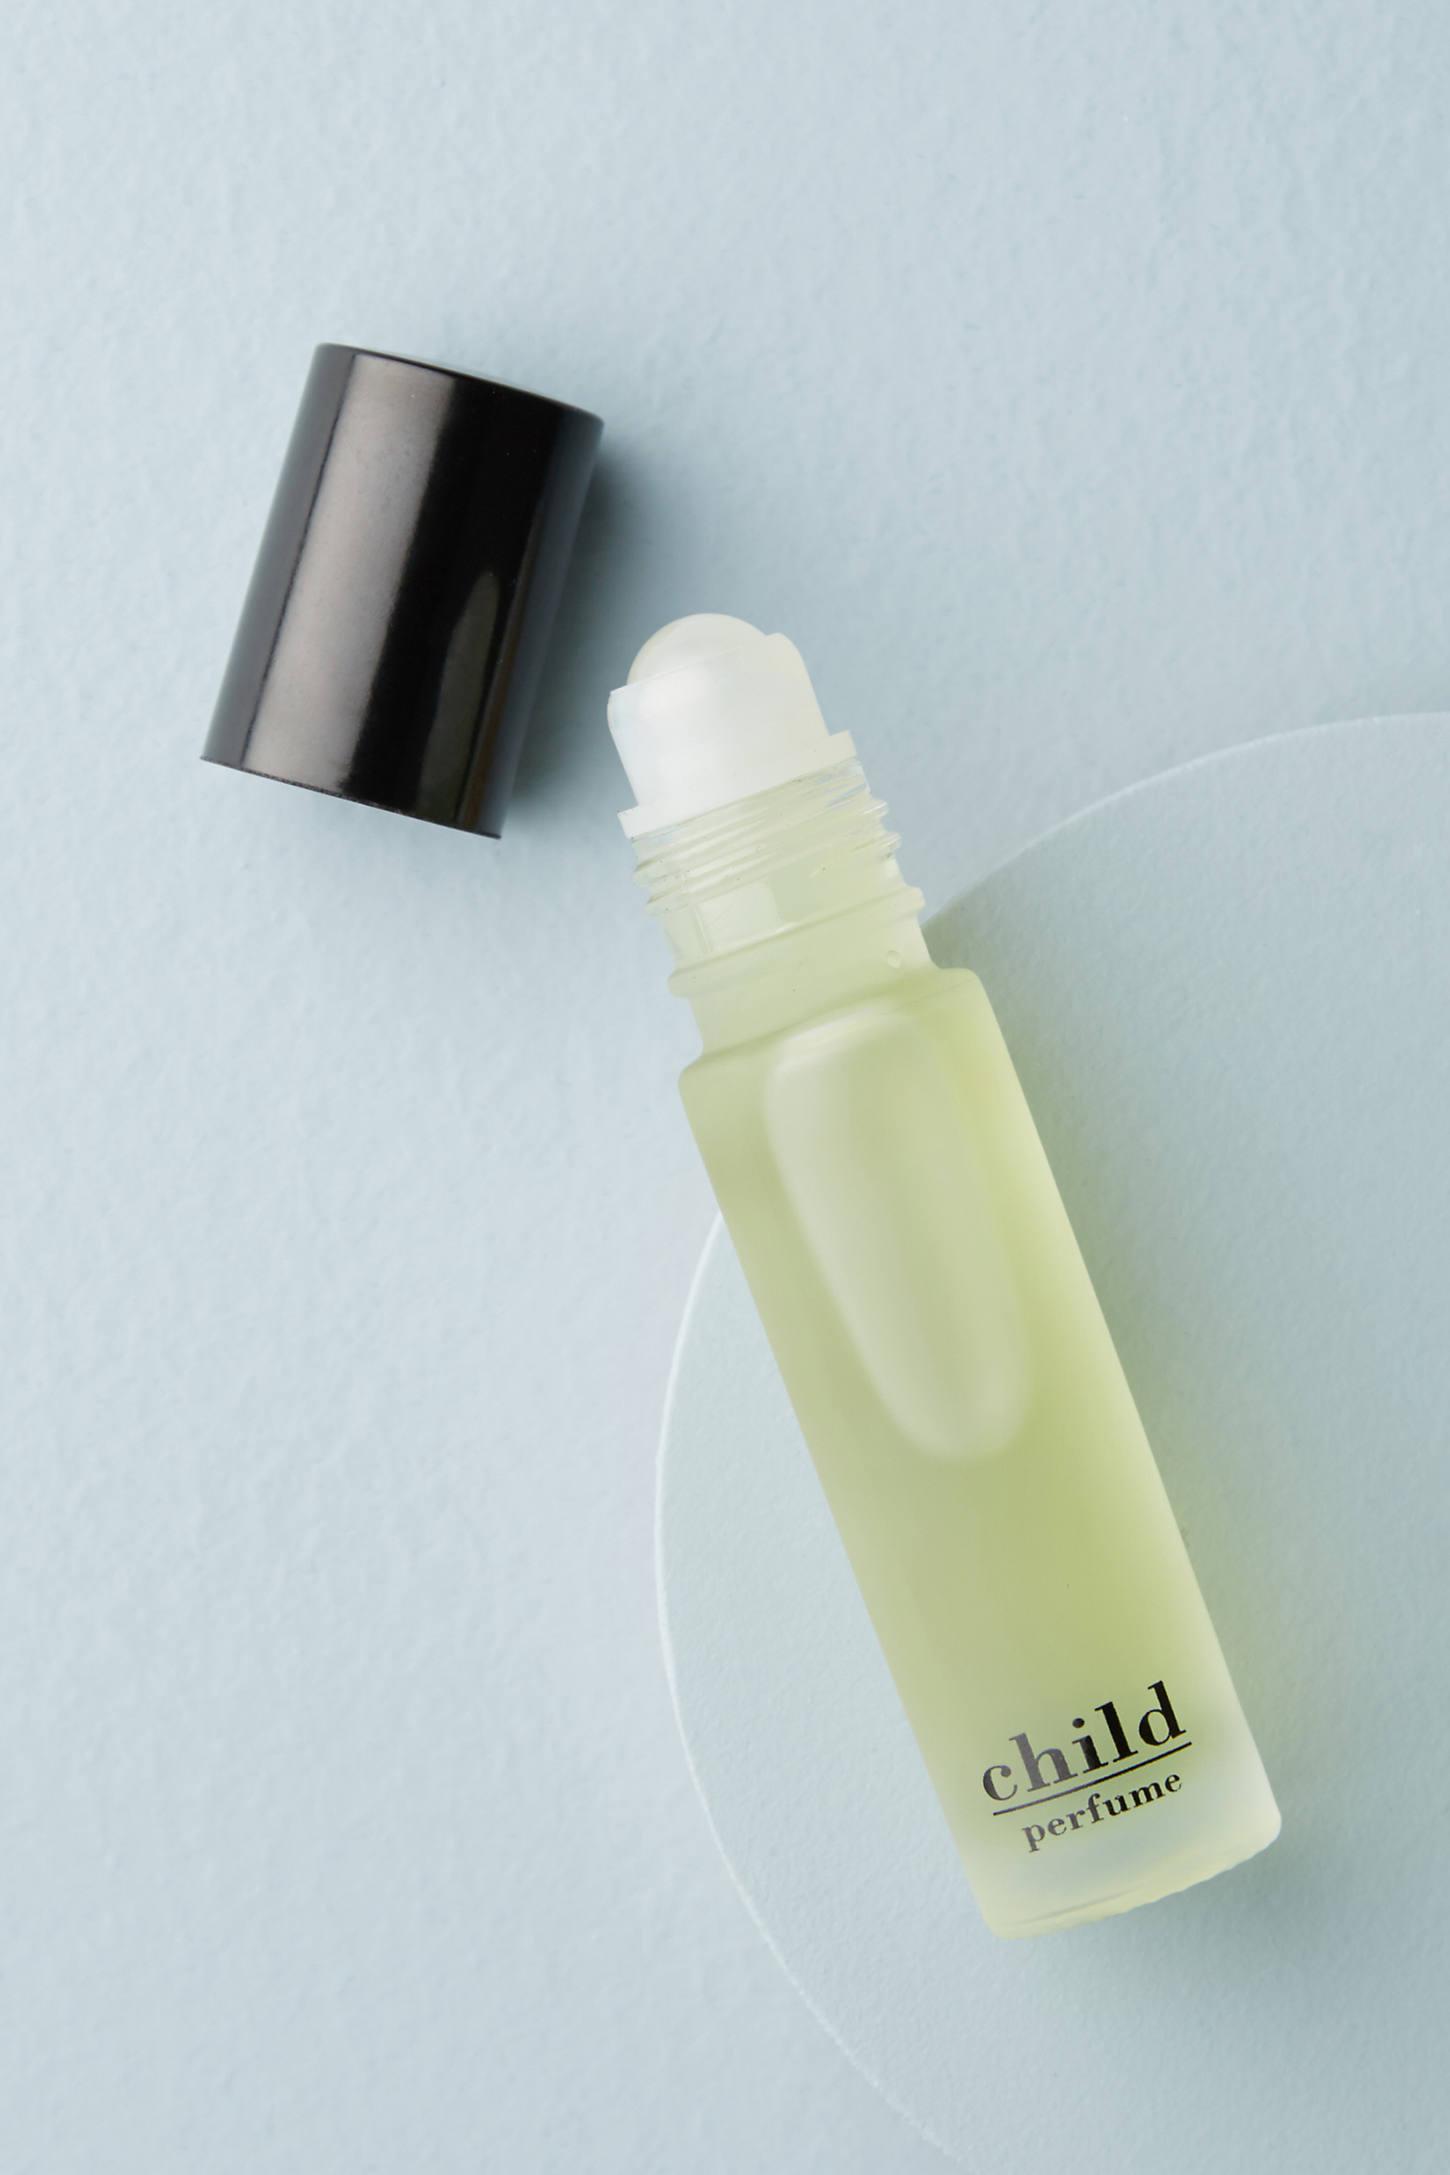 Child Perfume Mini Rollerball Perfume